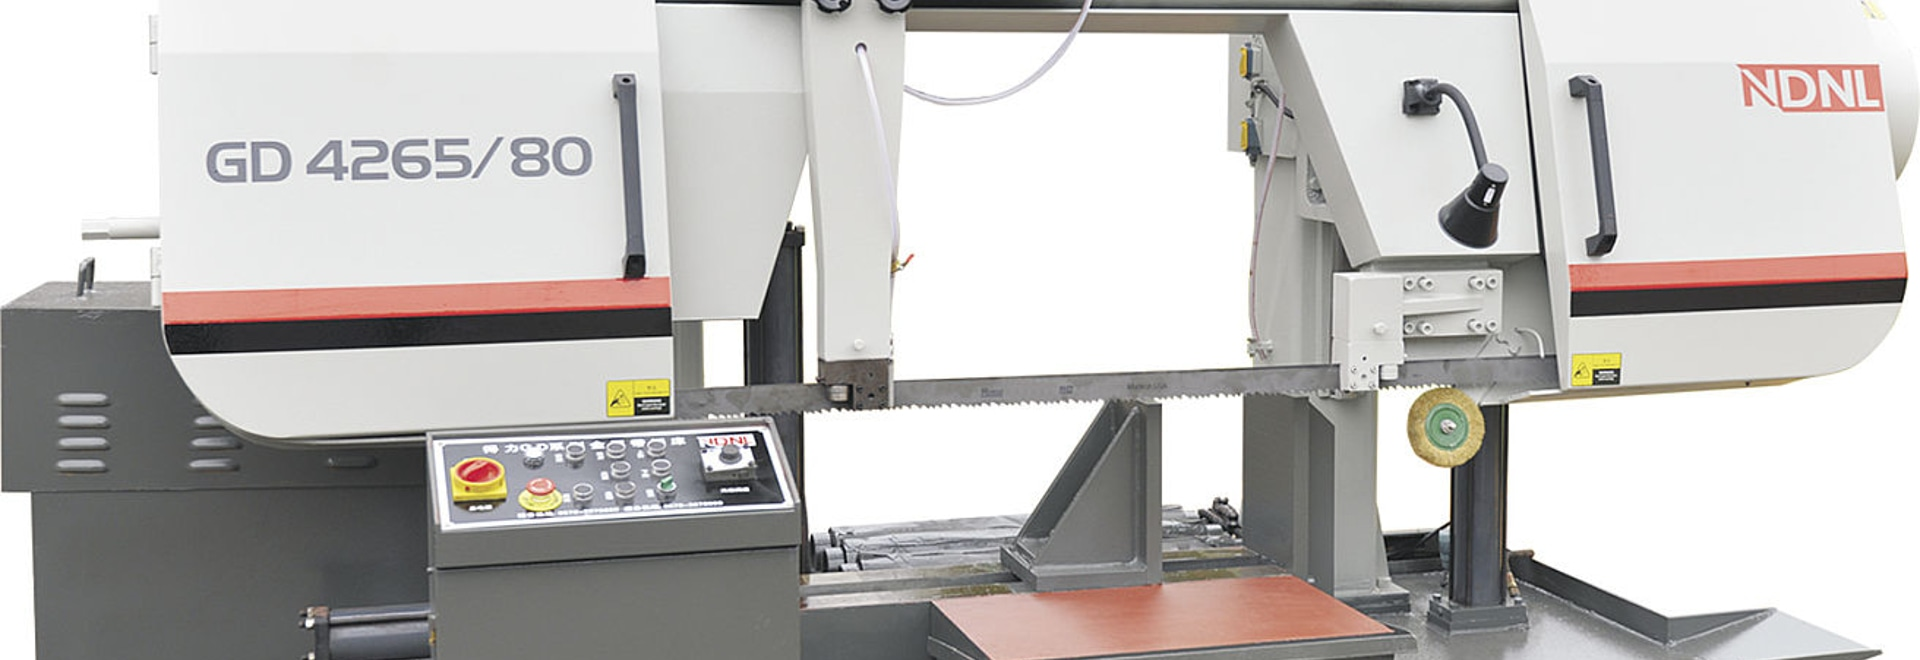 Double-column horizontal metal band sawing machine-NDNL